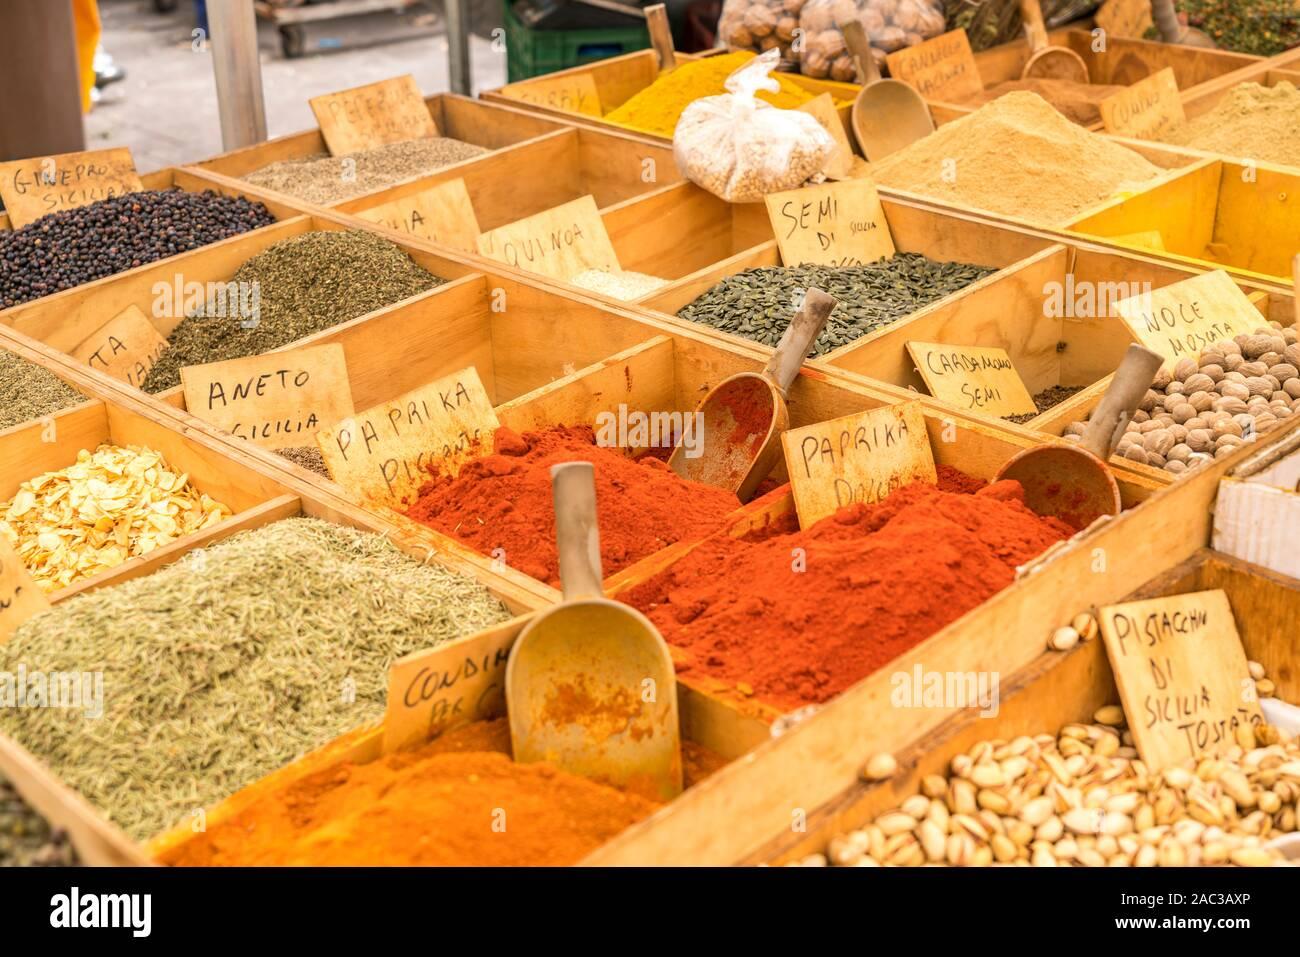 Gewürze und Nüsse auf dem Markt,  Insel Ortigia, Syrakus, Sizilien, Italien, Europa     spices and nuts on the market, Ortygia island,  Syracuse, Sici Stock Photo